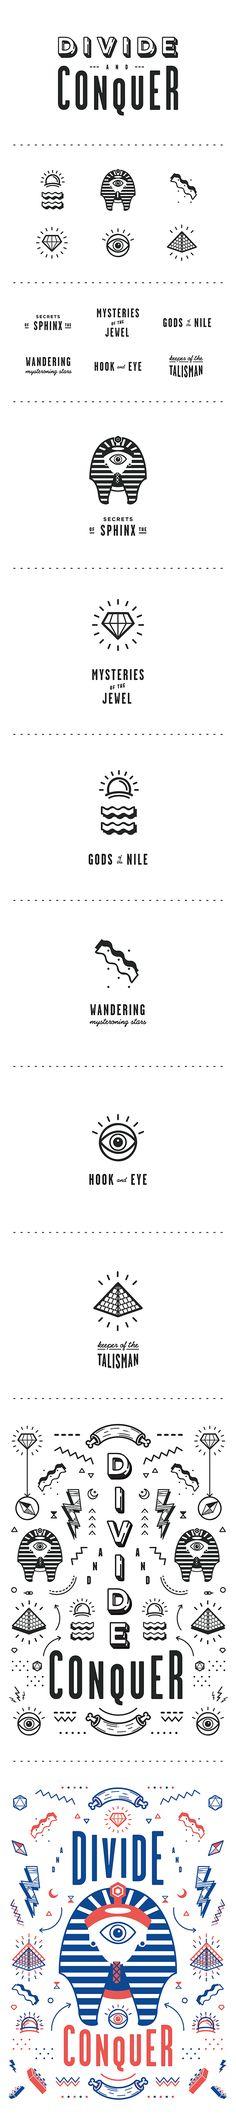 design, icon, logo,